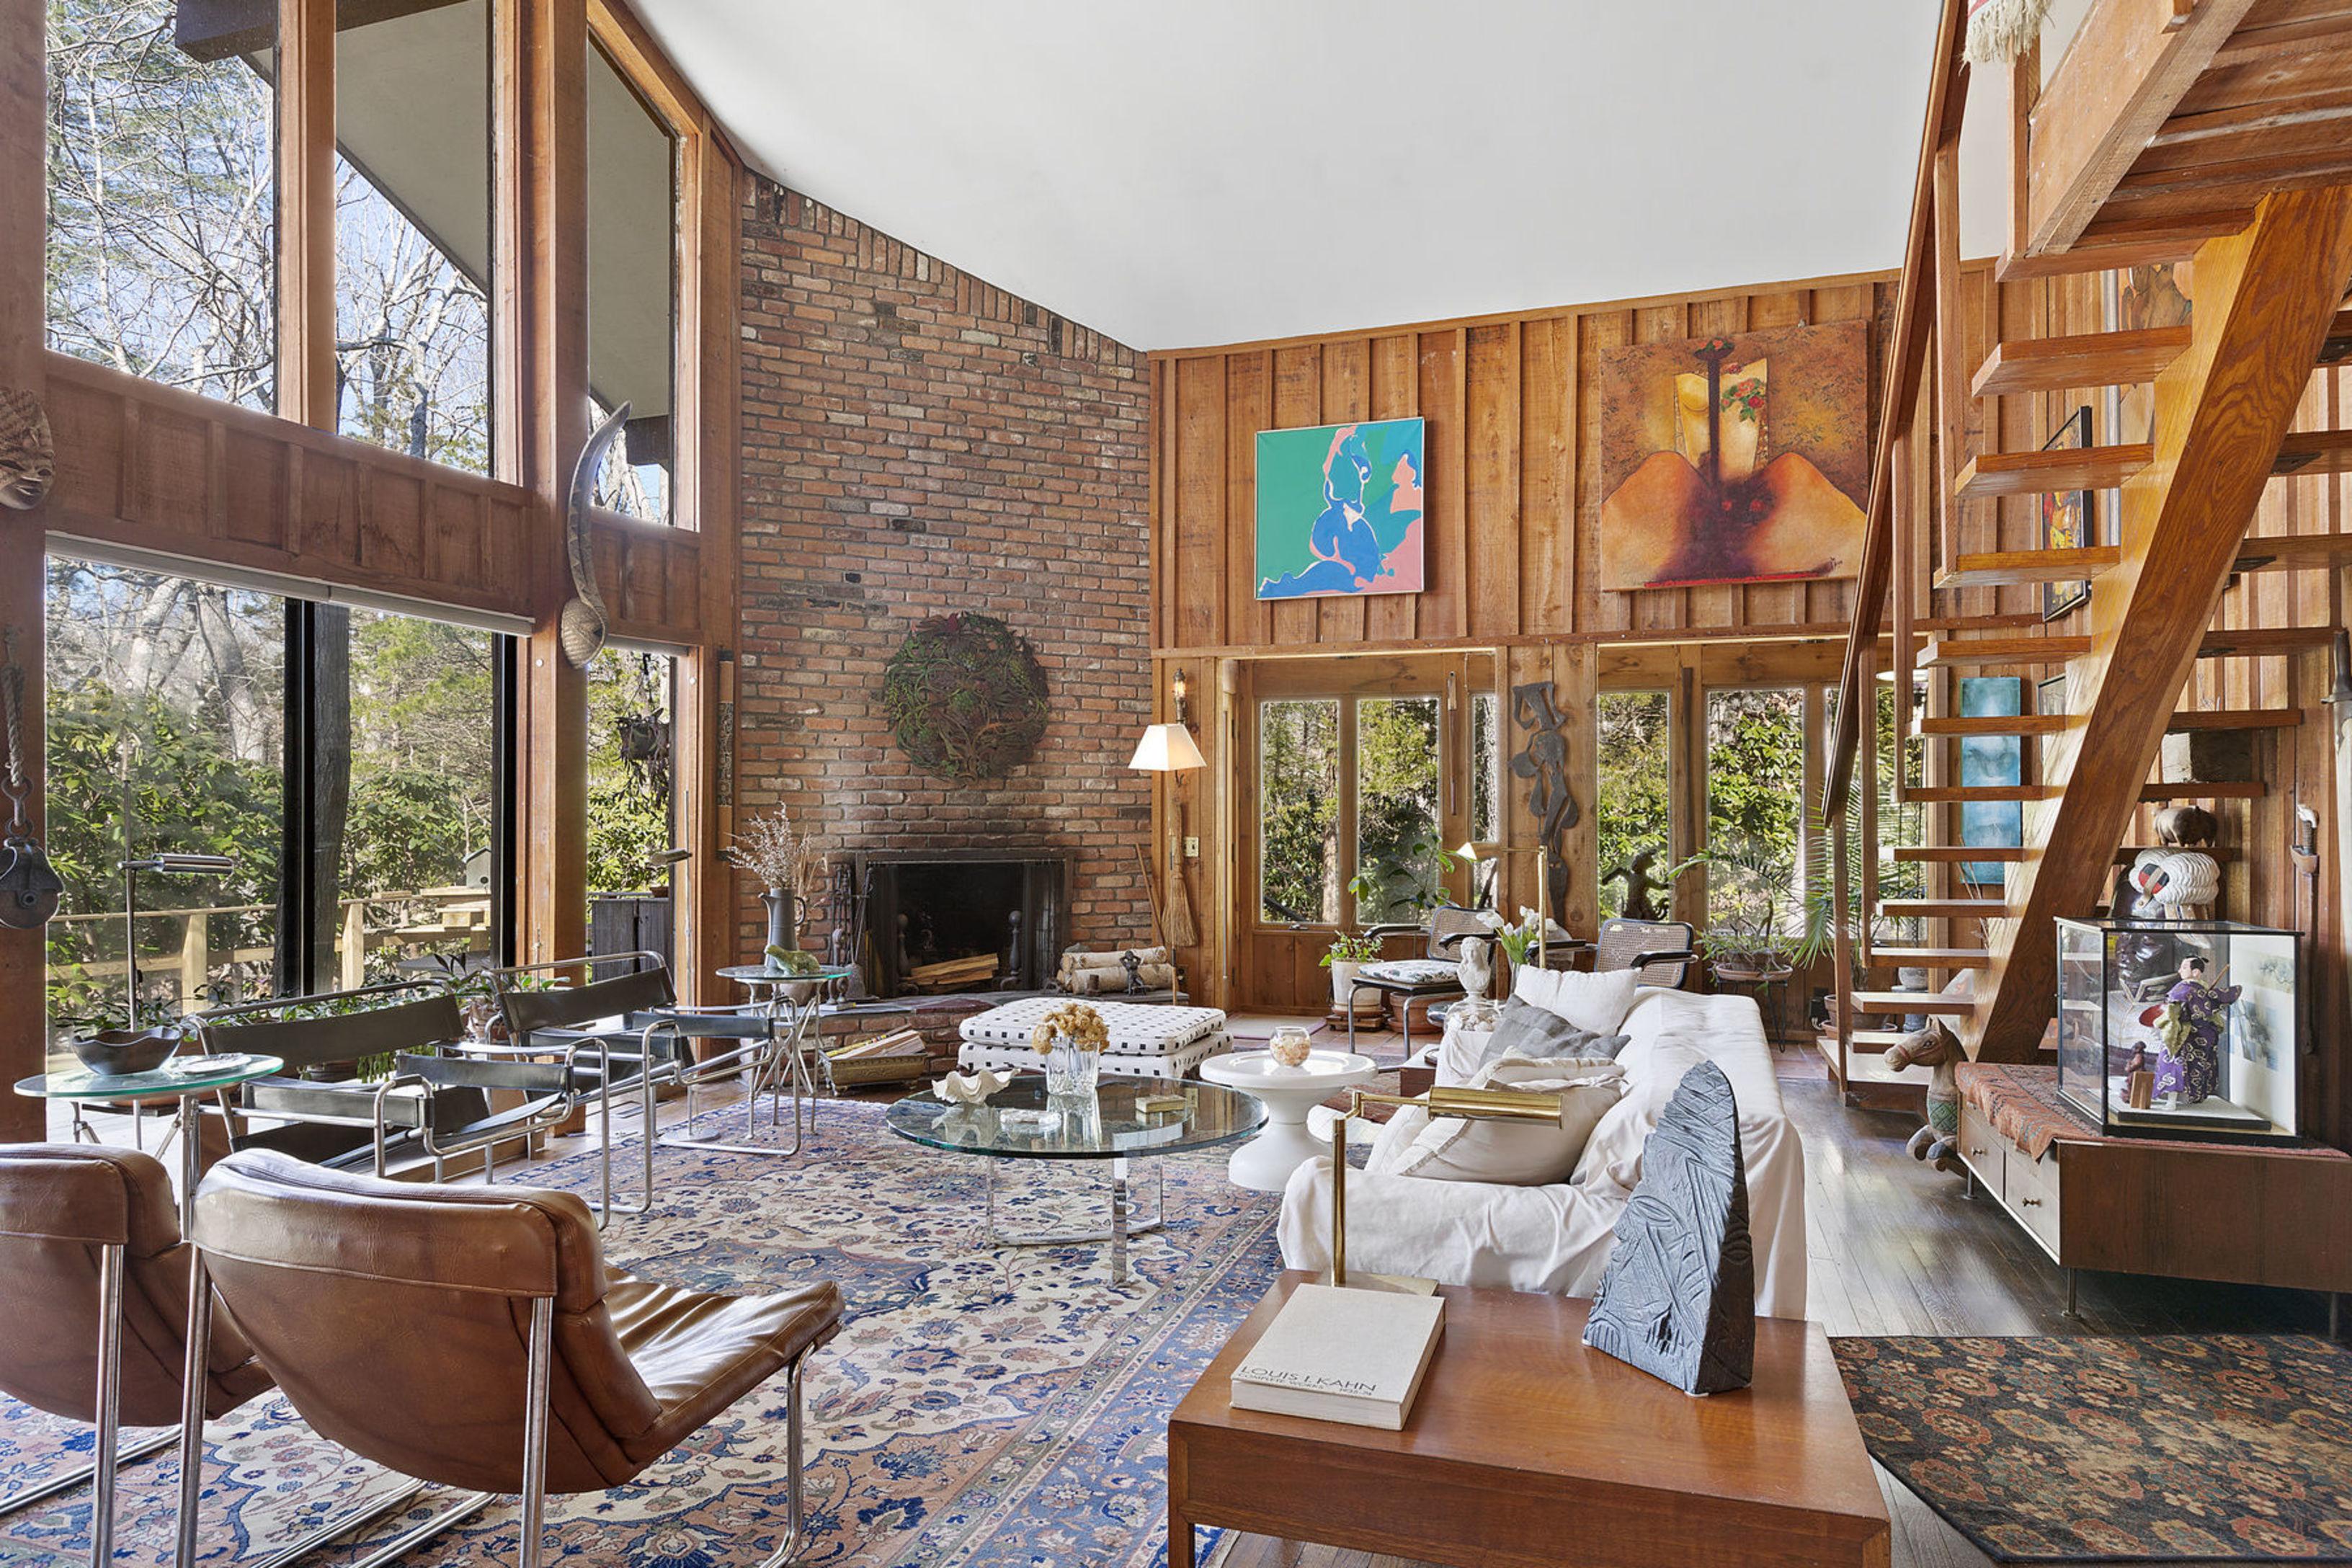 125 Windward - East Hampton Springs, New York